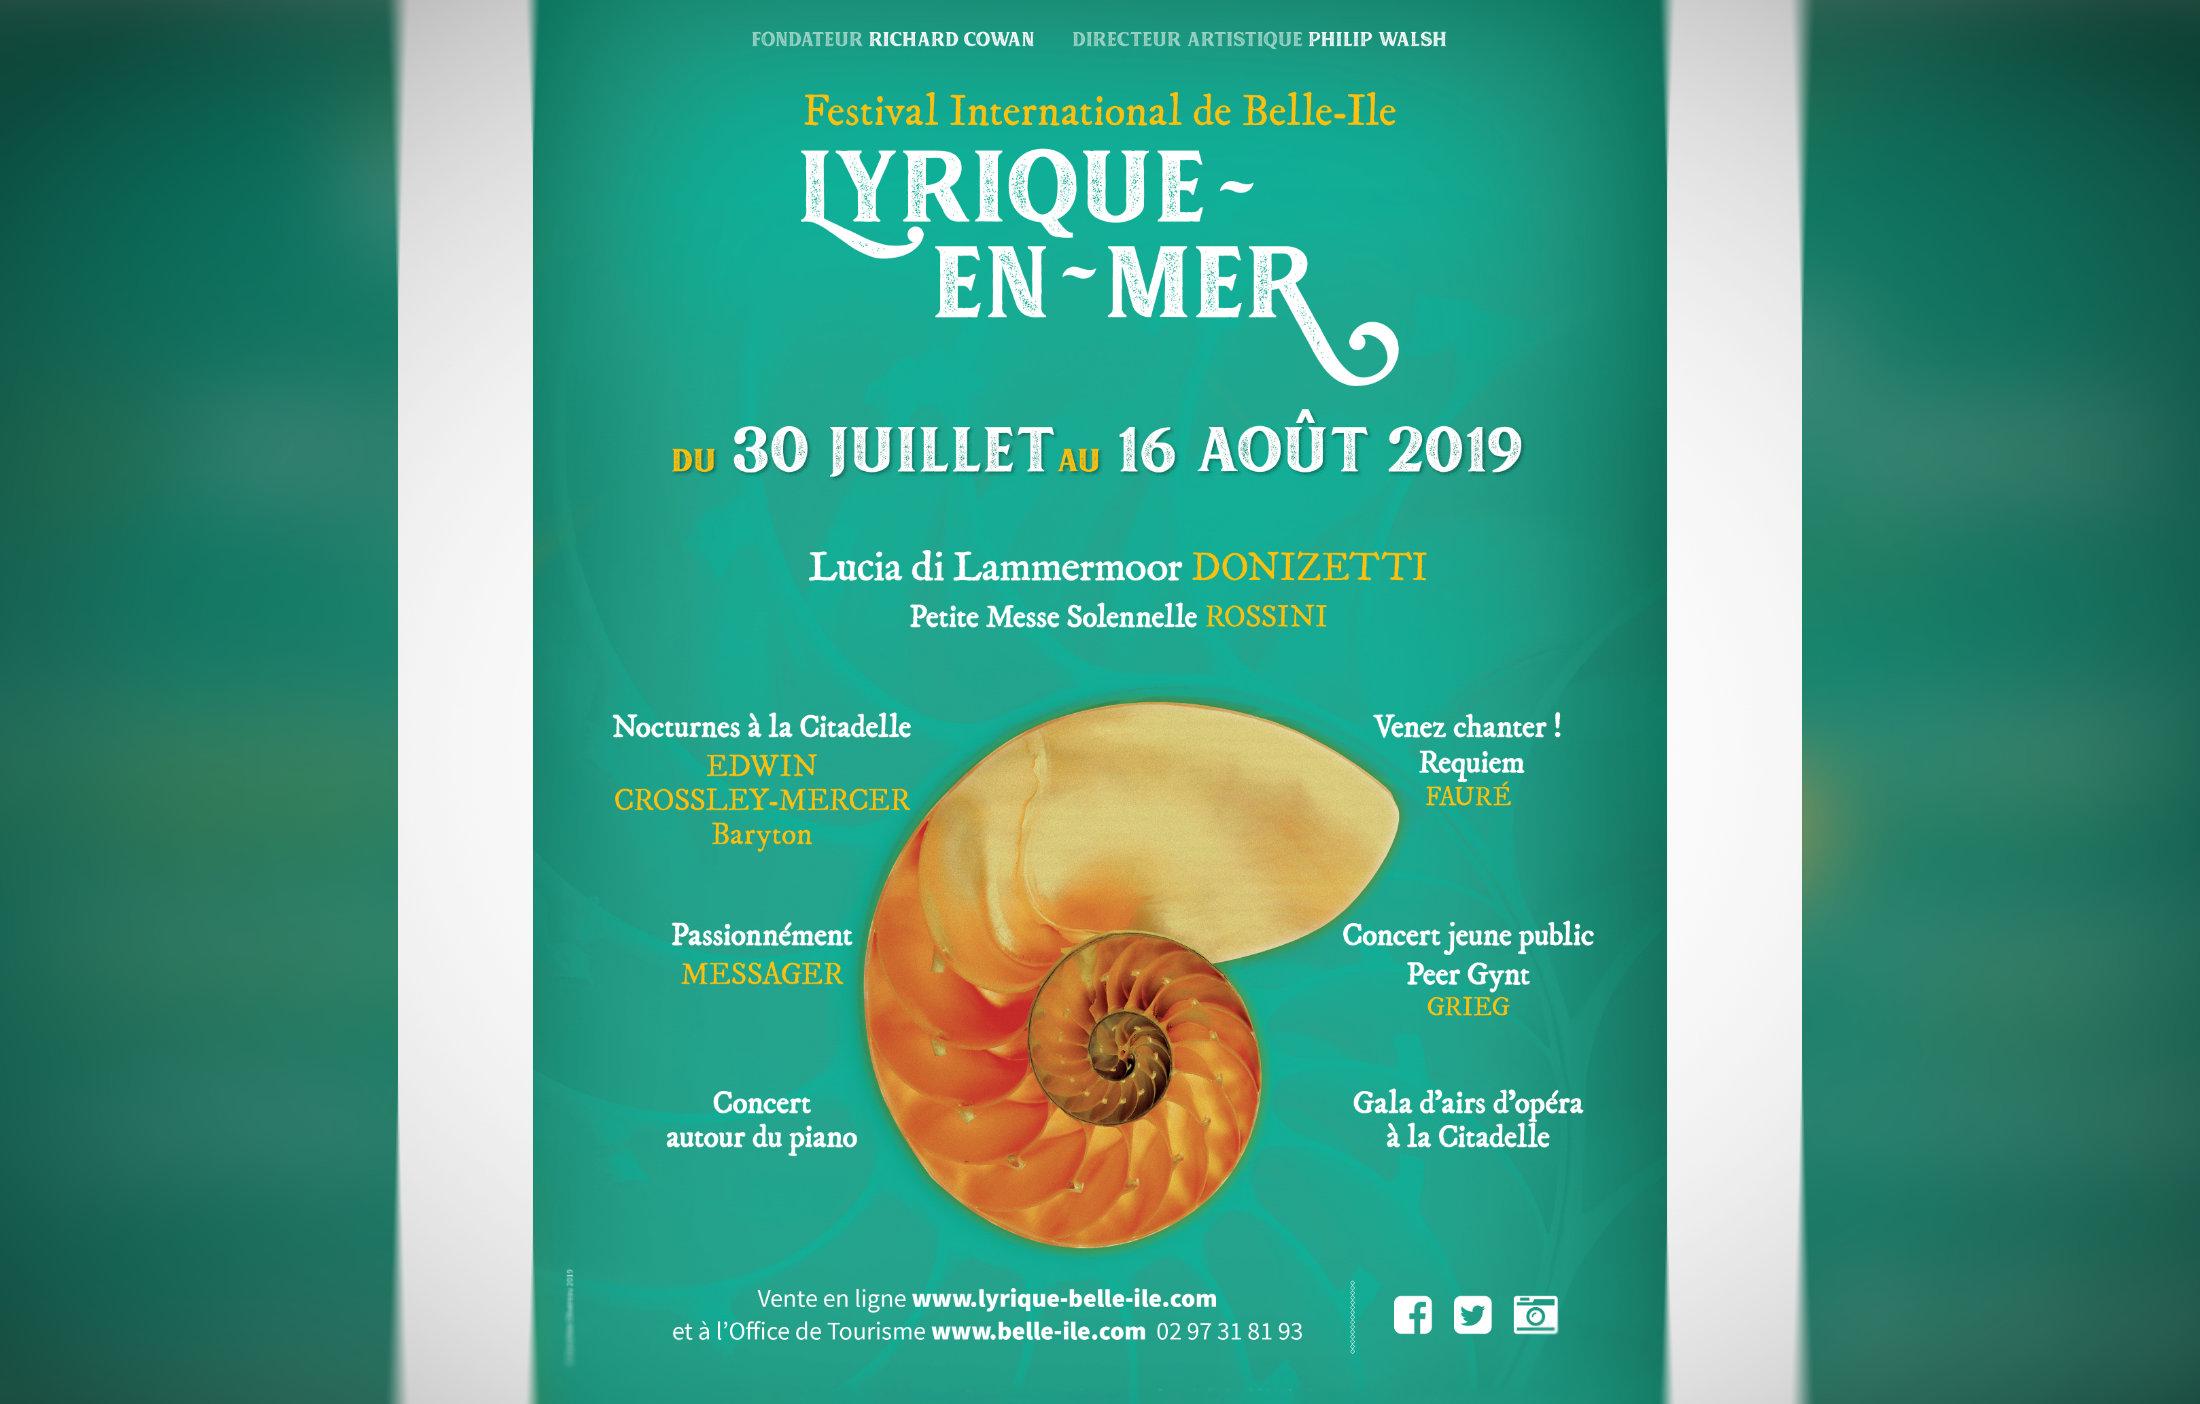 Festival-Lyrique-en-mer-2019@2x